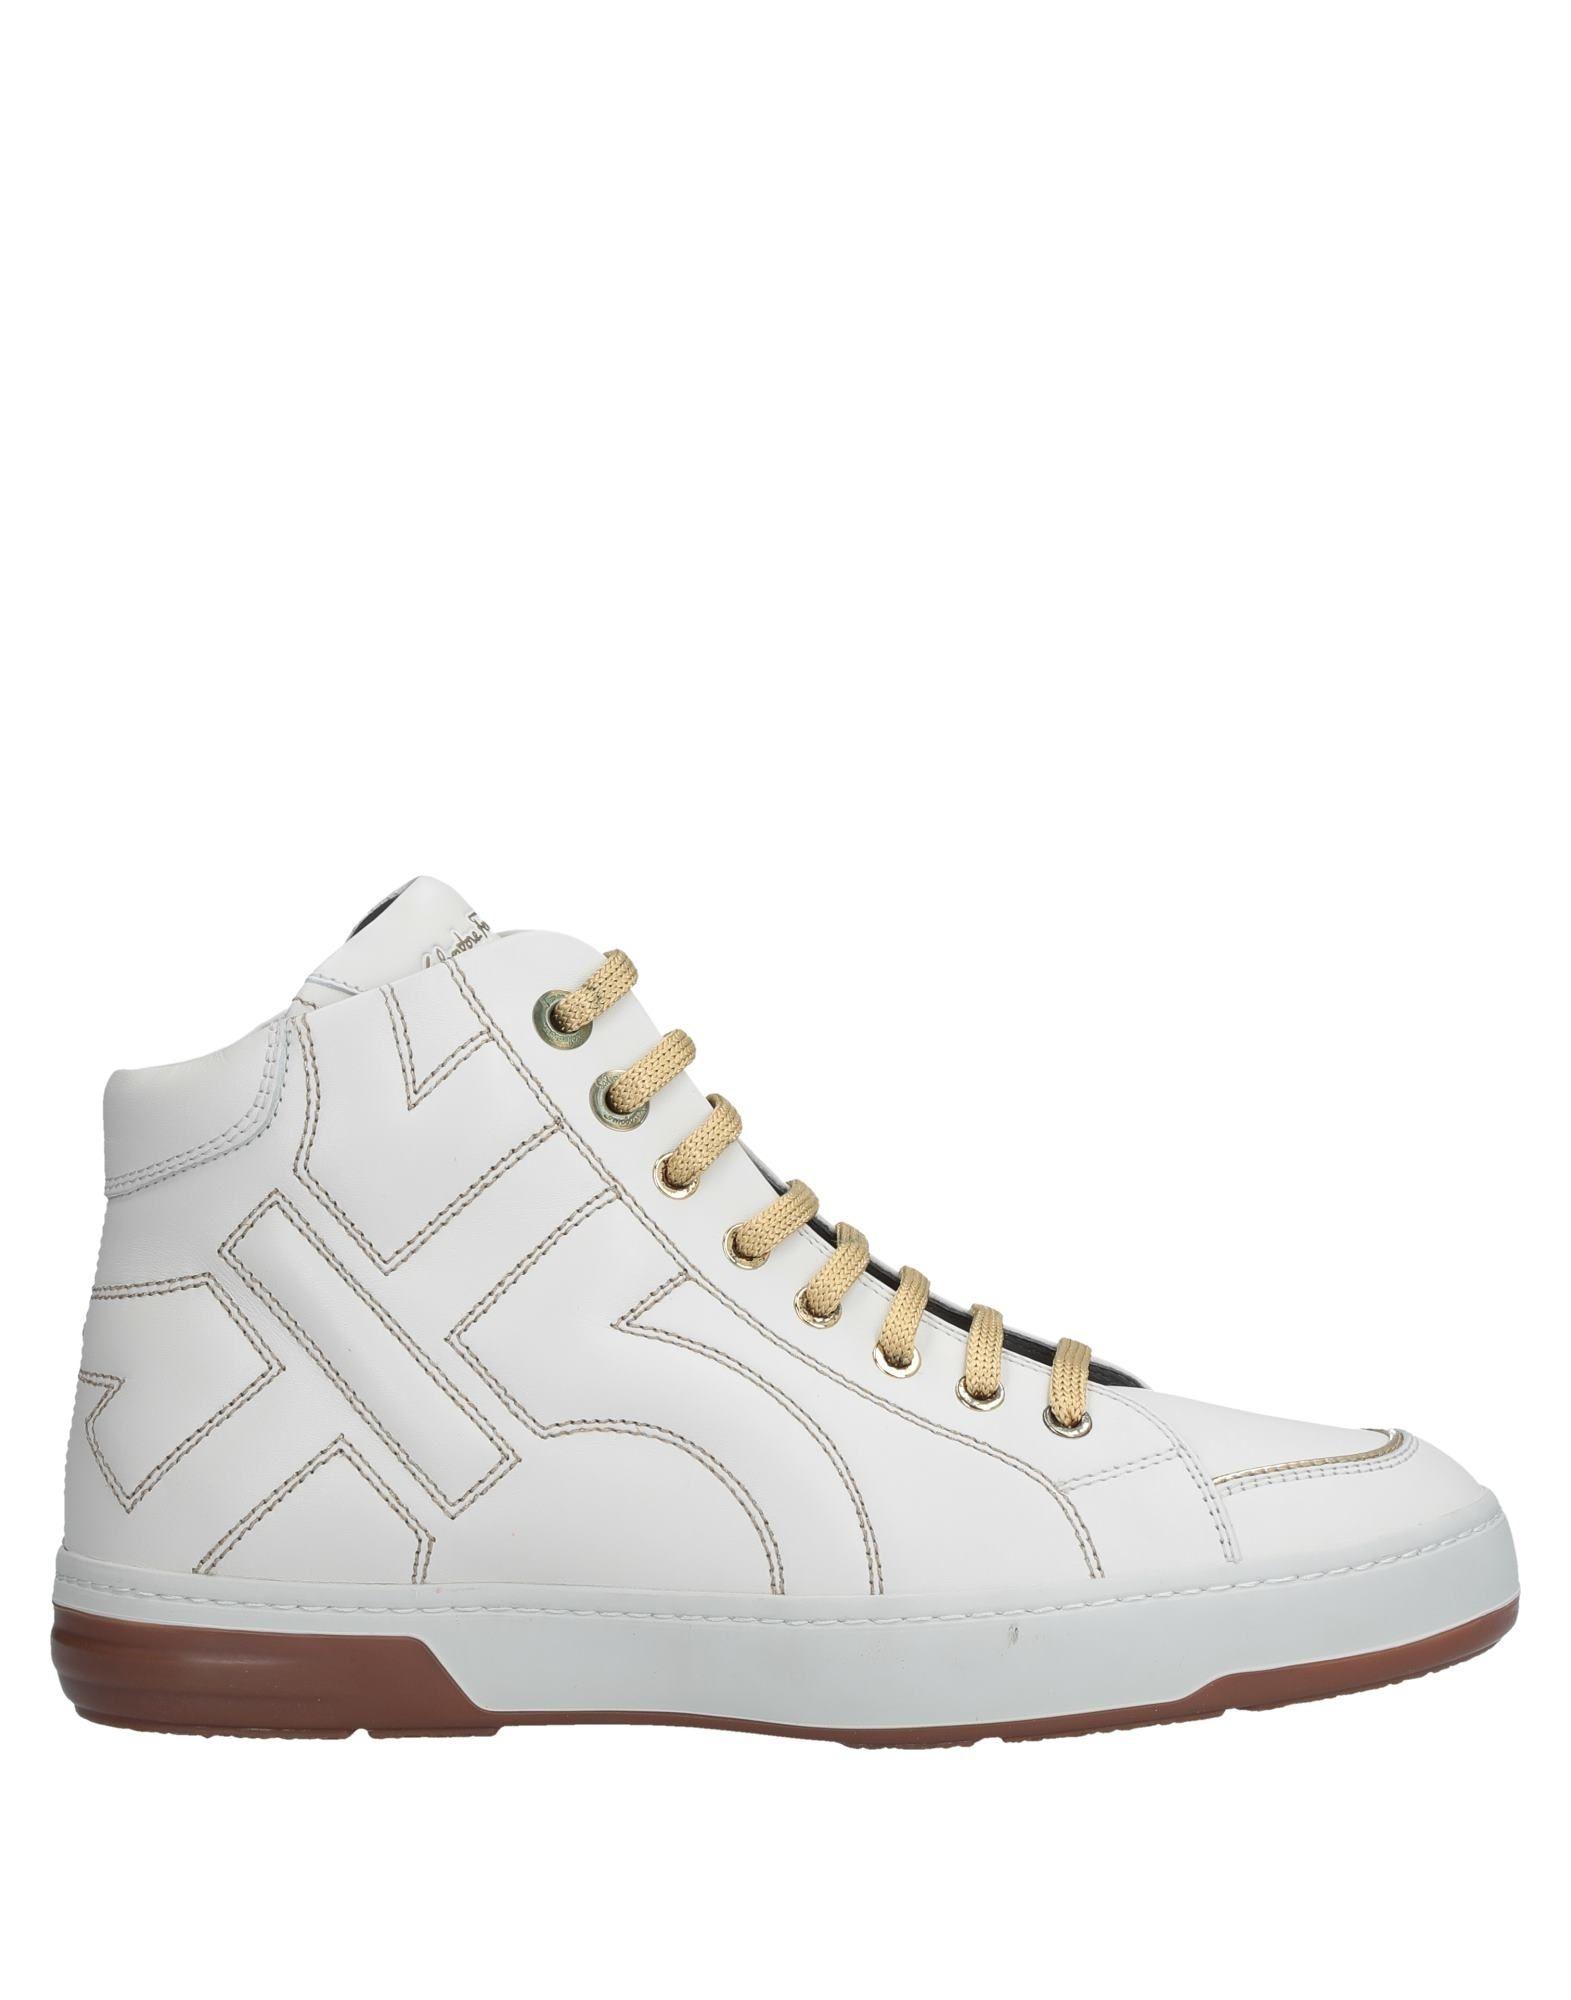 Salvatore Ferragamo Sneakers Herren  11544071FS Gute Qualität beliebte Schuhe